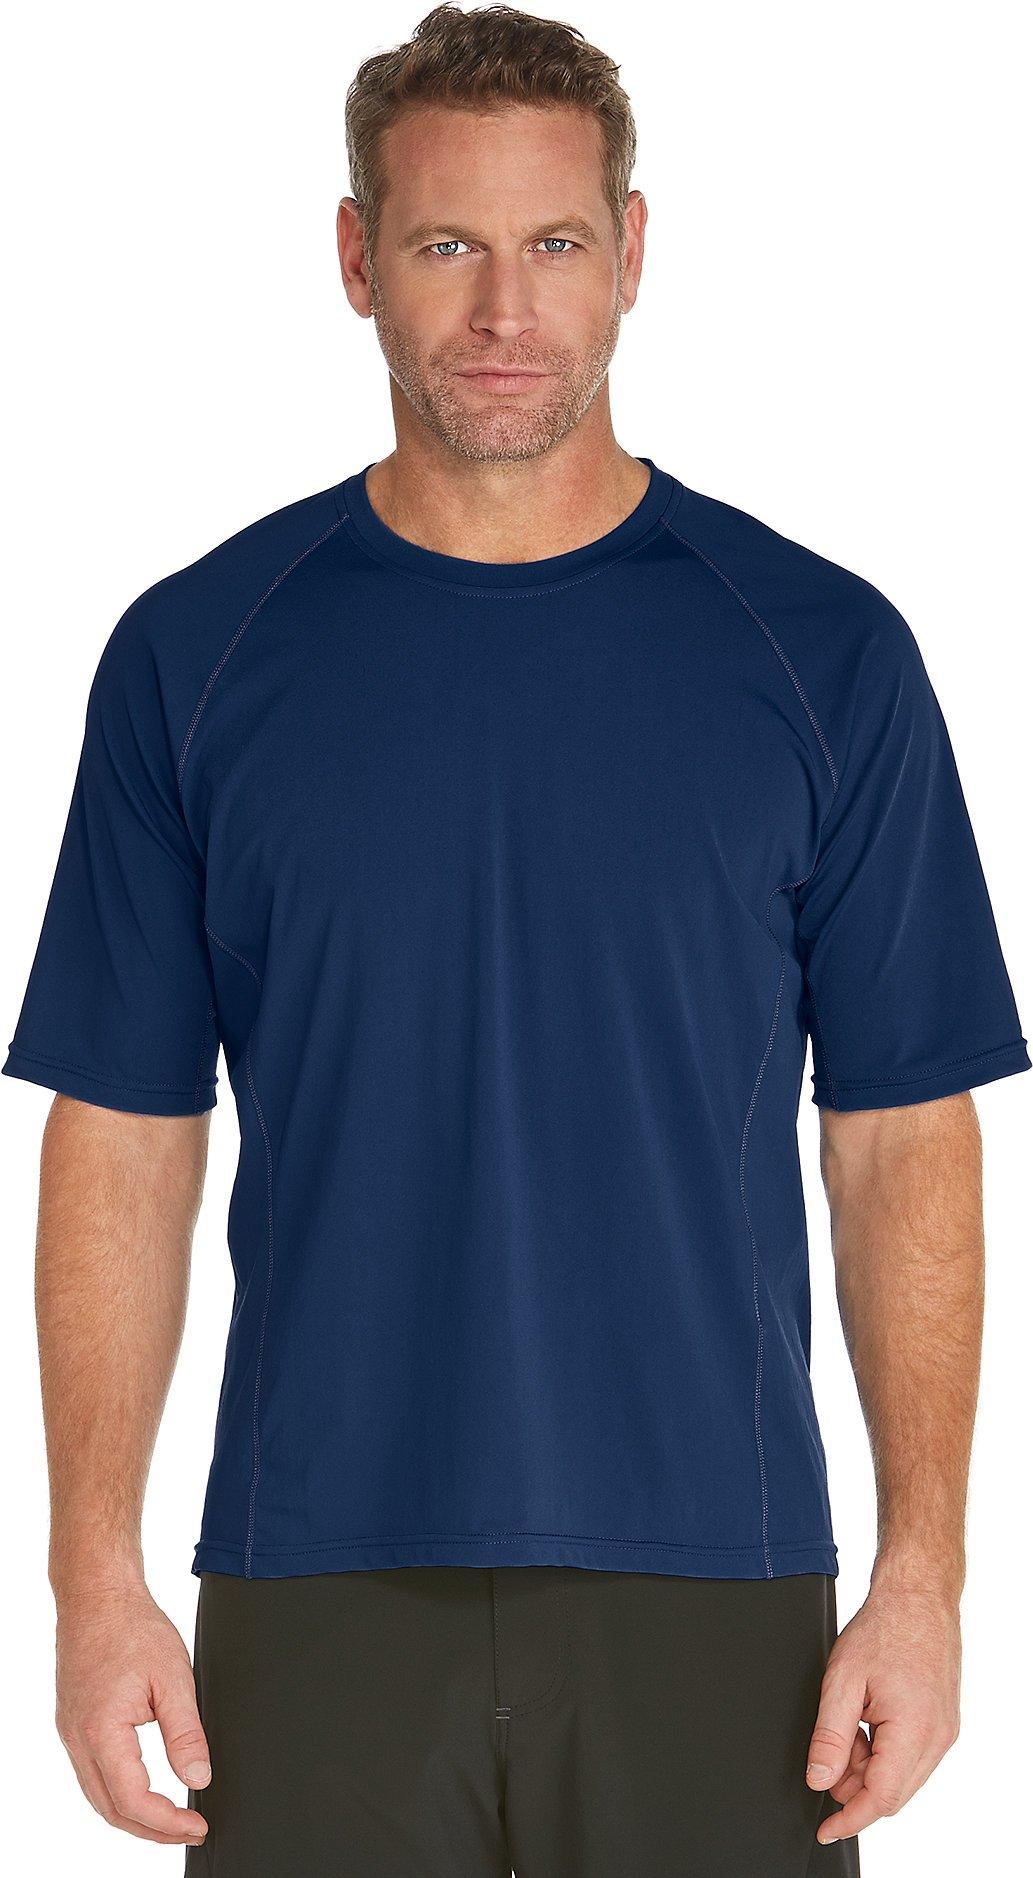 Coolibar UPF 50+ Men's Short Sleeve High Tide Swim Shirt - Sun Protective (X-Large- Navy)